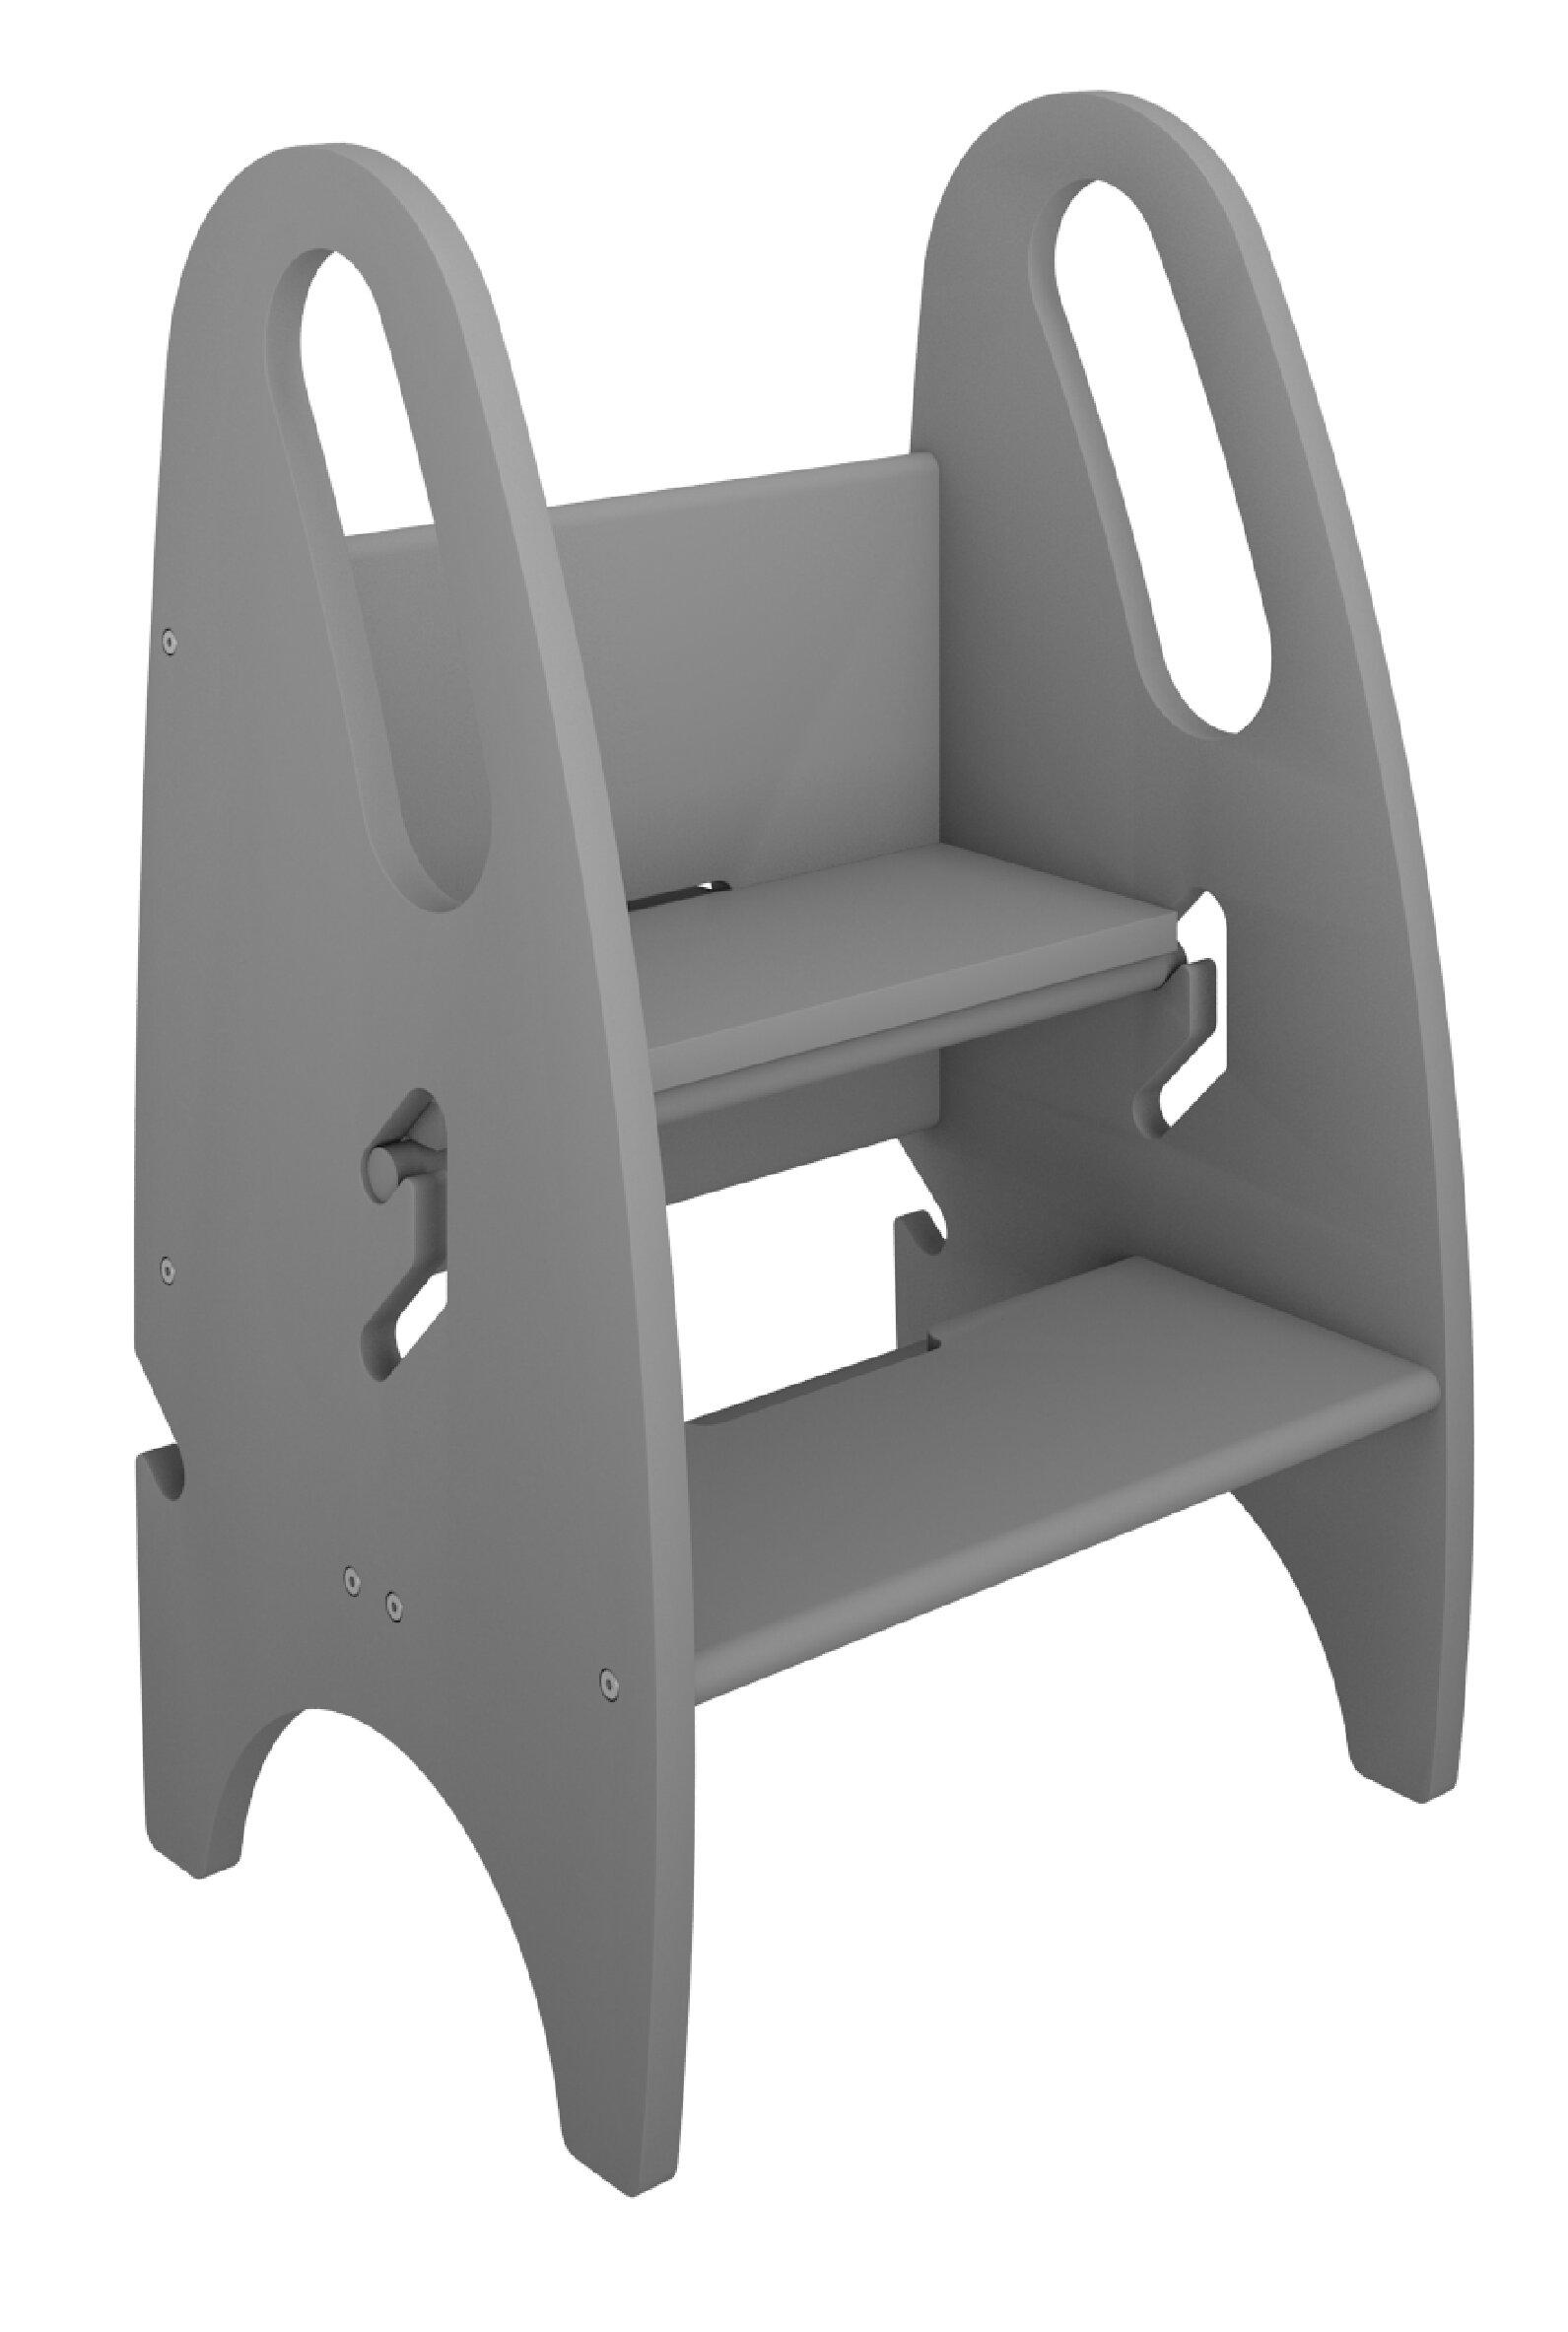 step stool rubbermaid storage pdx with load capacity aluminum lb organization wayfair